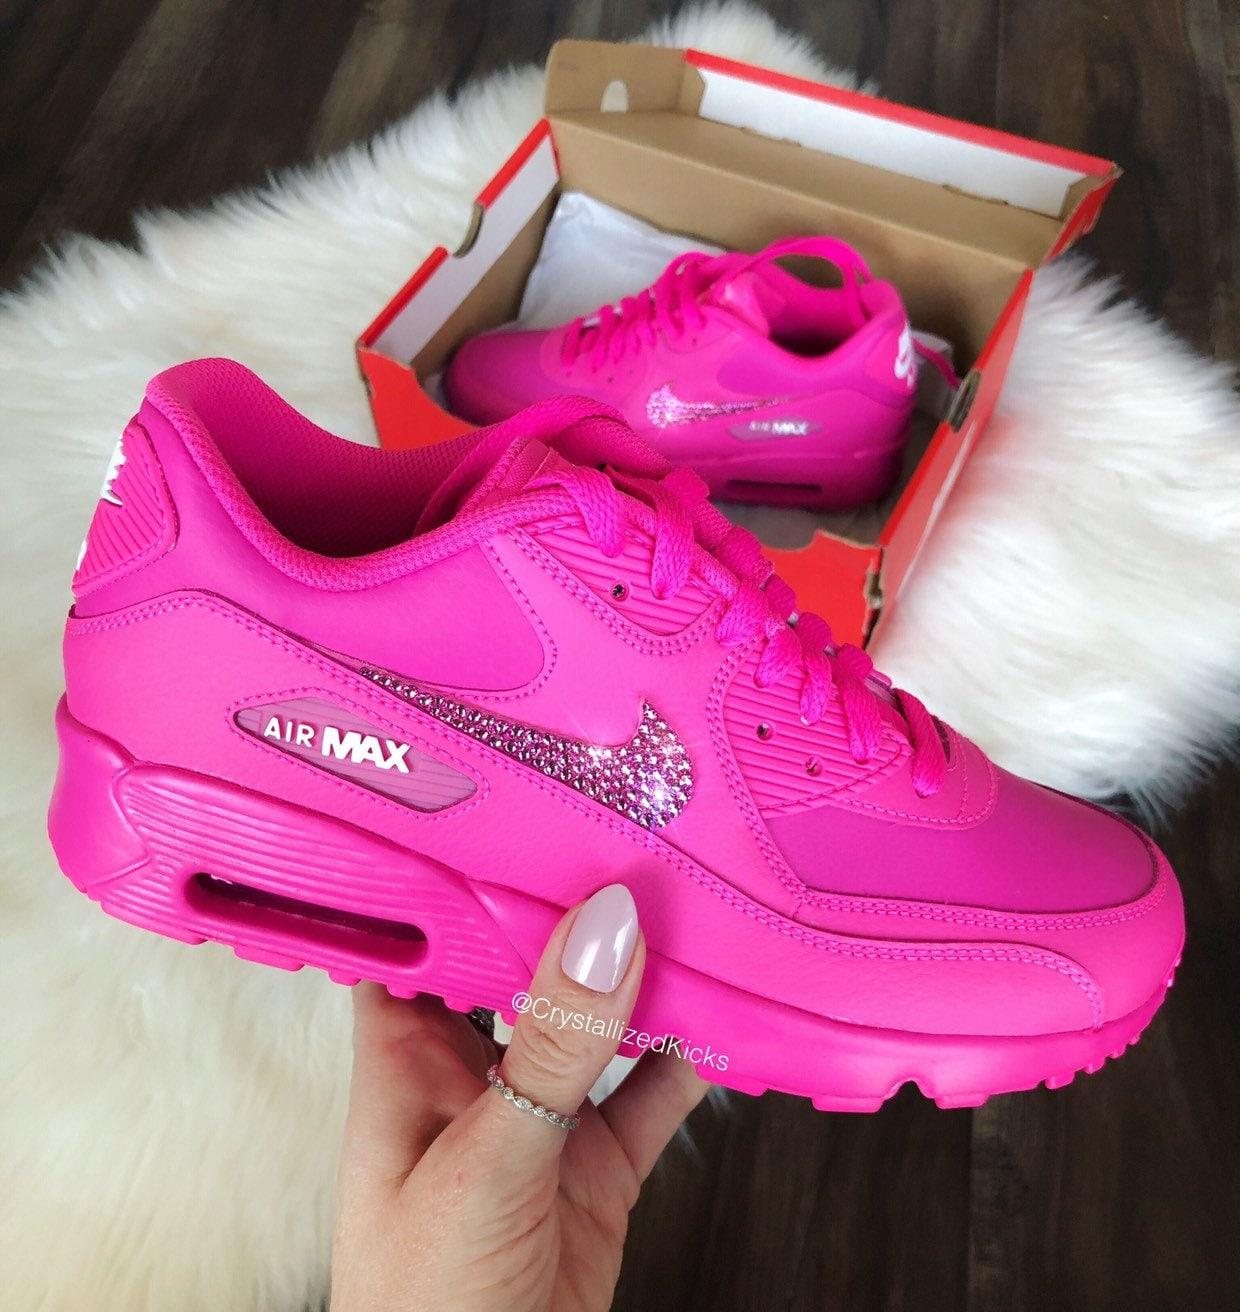 quality design 1038f 499ba Bling Swarovski Nike Air Max 90 Youth Women Made with Swarovski Crystals -  Hot Pink